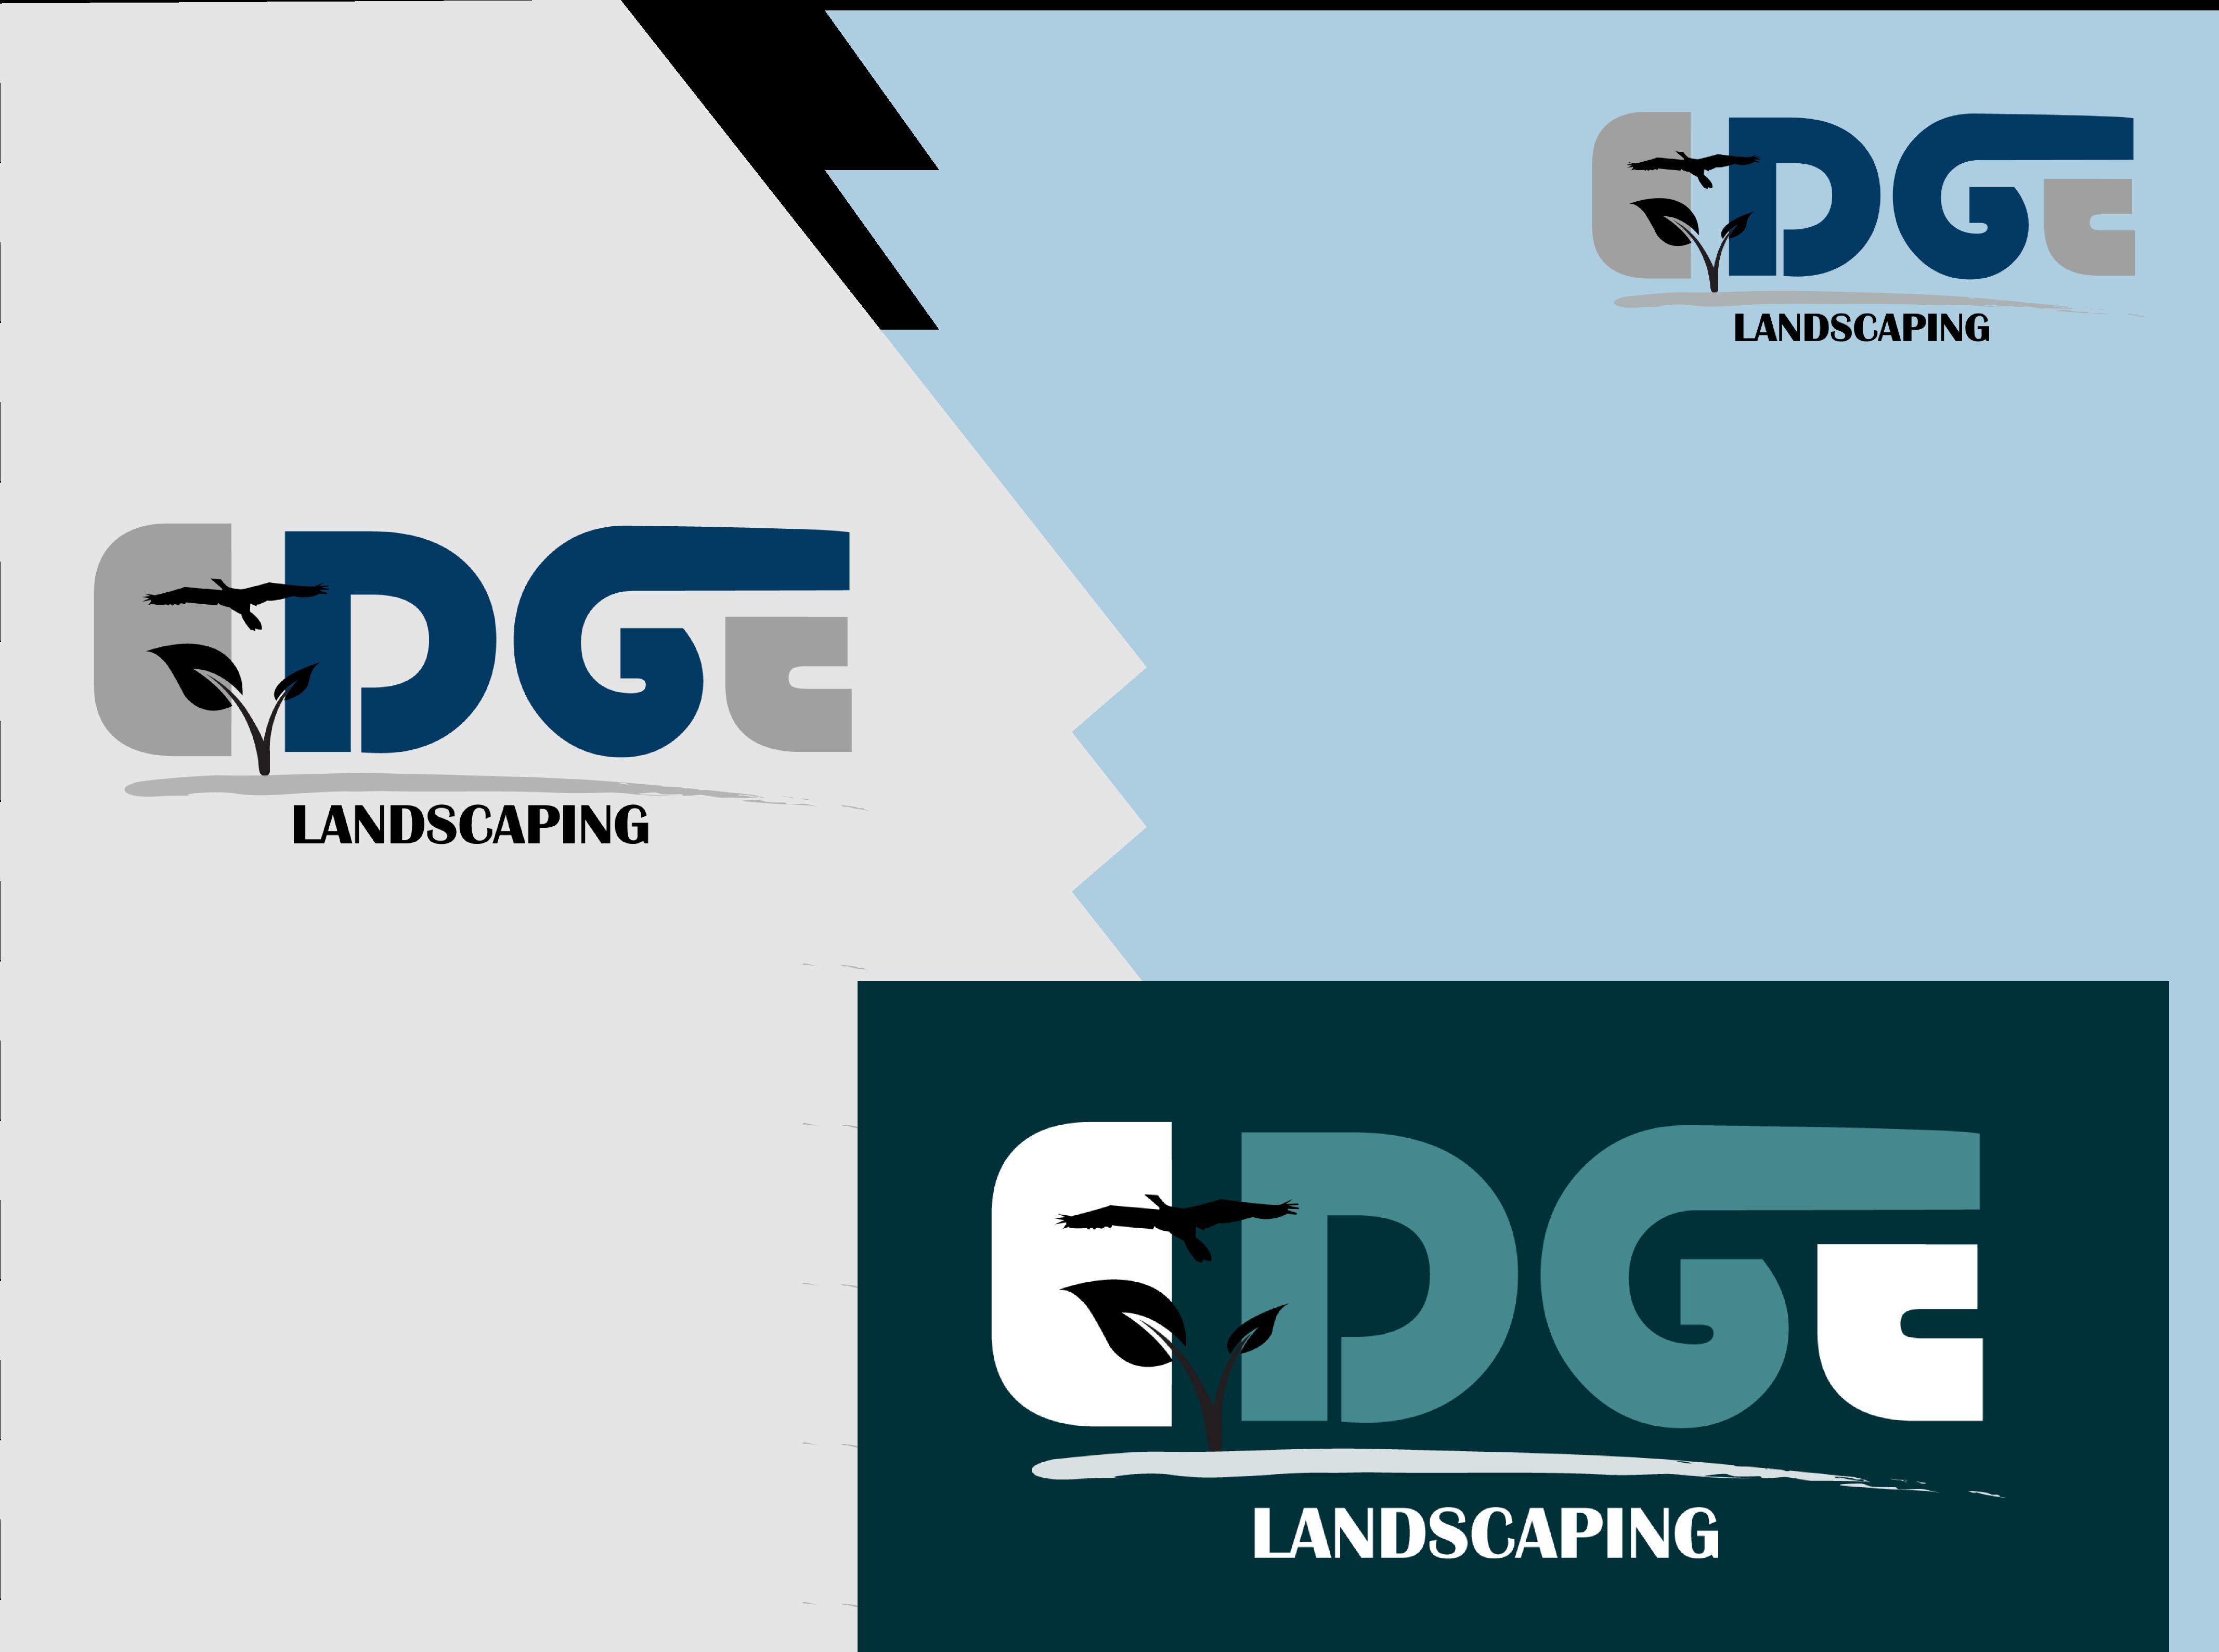 Logo Design by Saqib Hashmi - Entry No. 169 in the Logo Design Contest Inspiring Logo Design for Edge Landscaping.